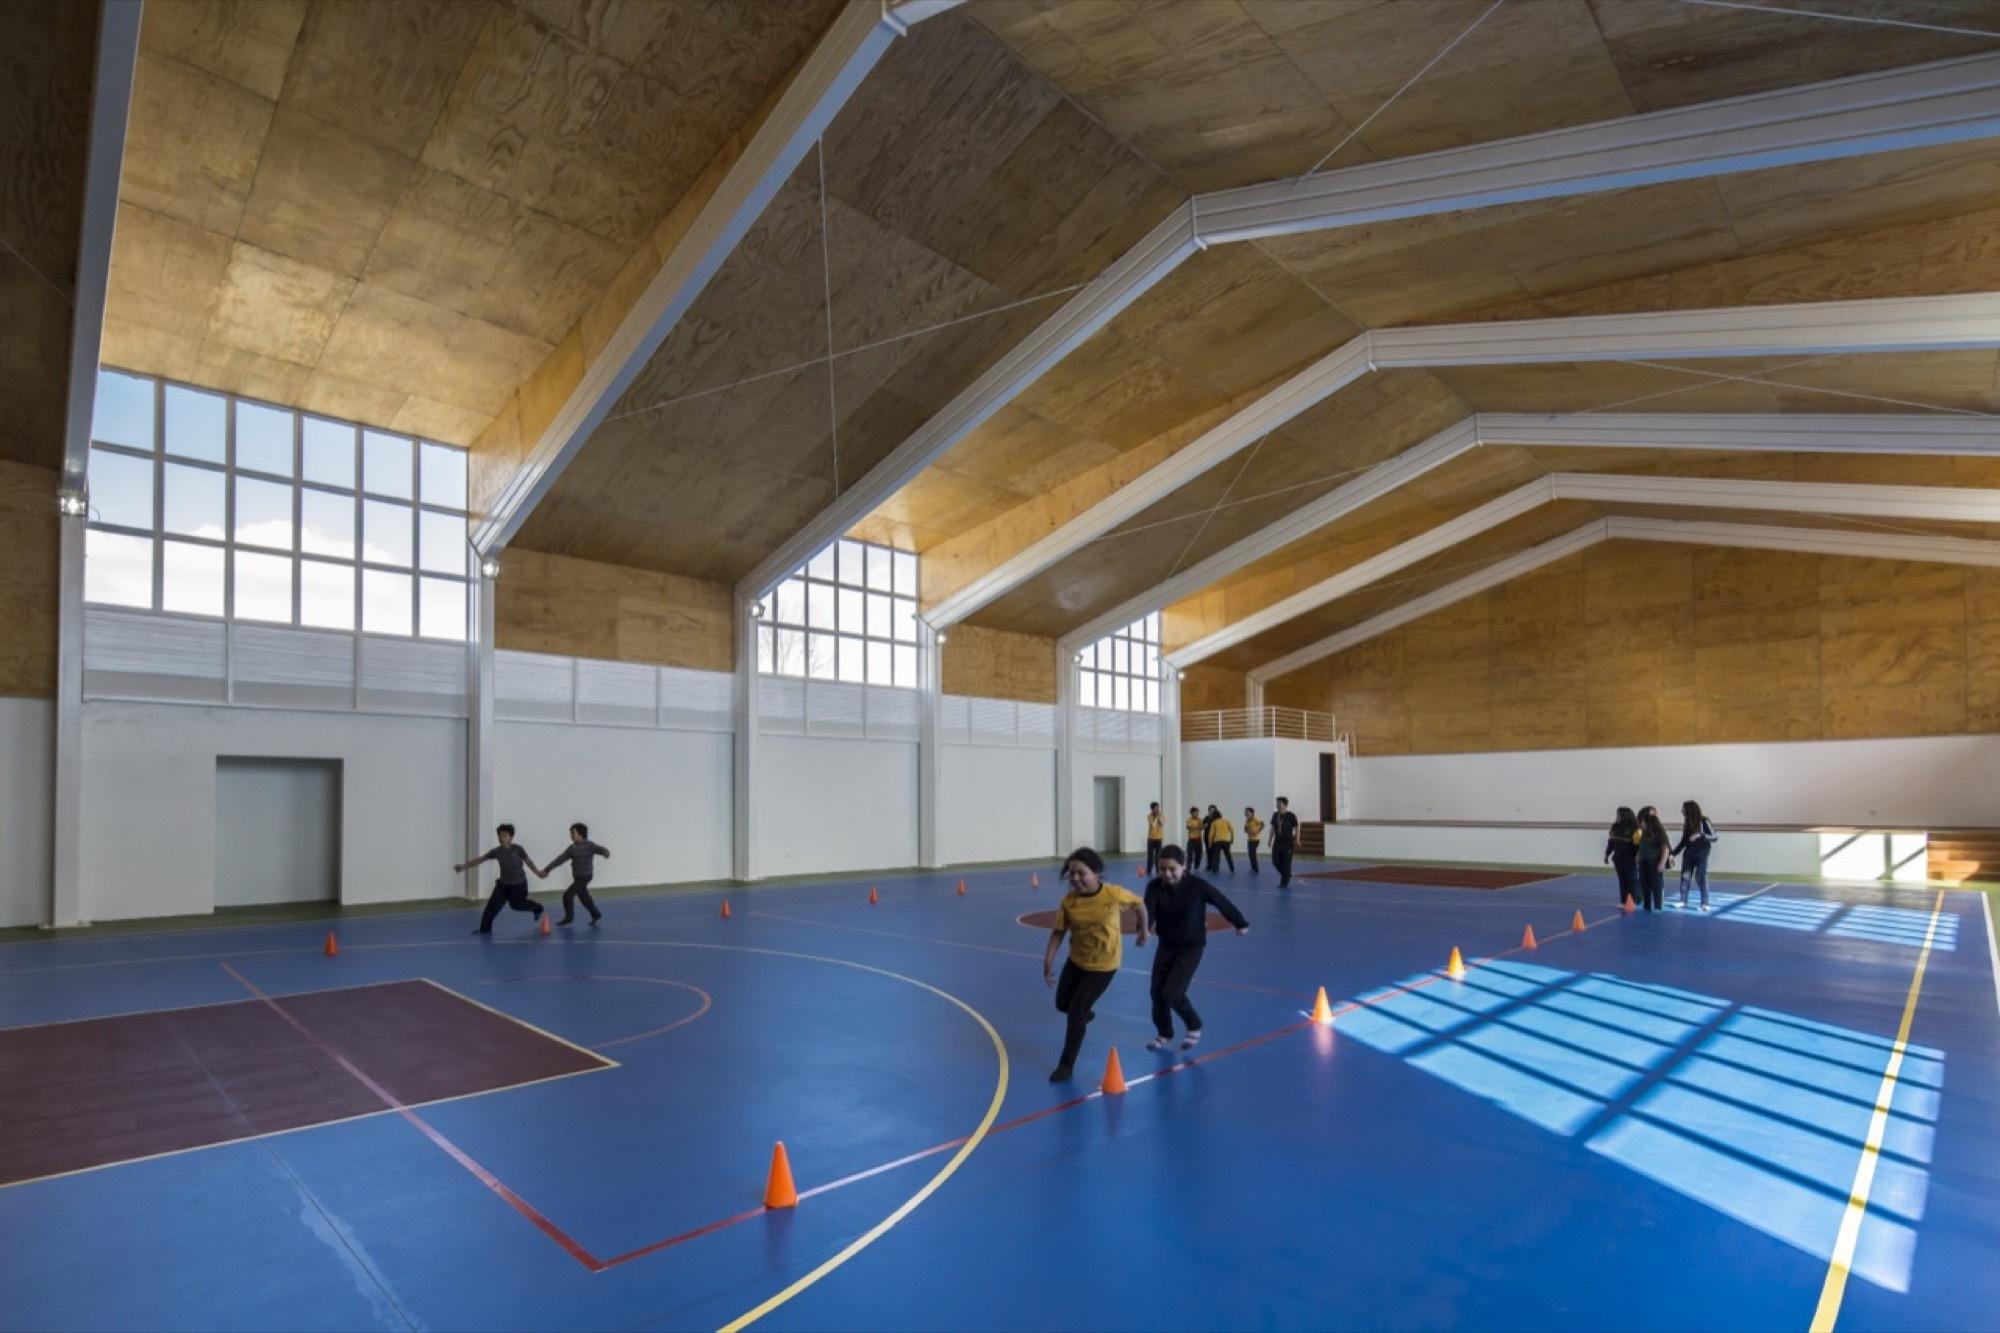 Gallery of Lonqun School Gymnasium  COMUN Arquitectos  10